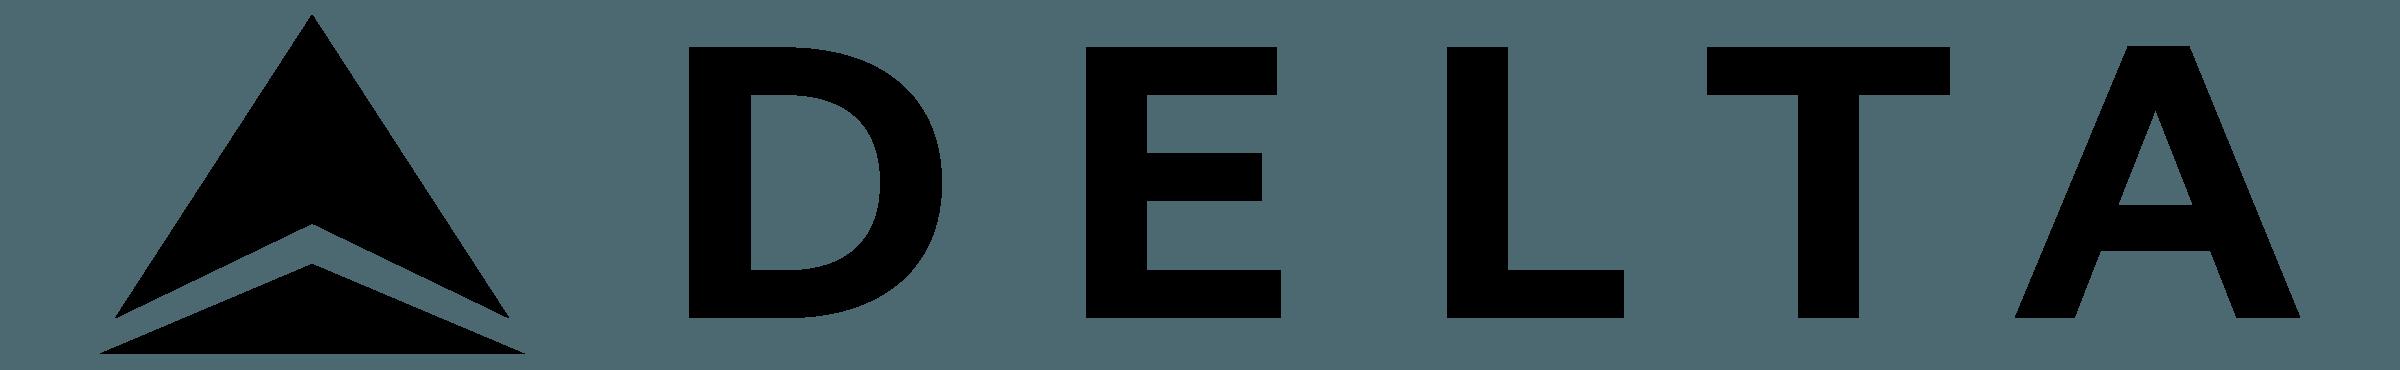 delta-logo-black-transparent.png